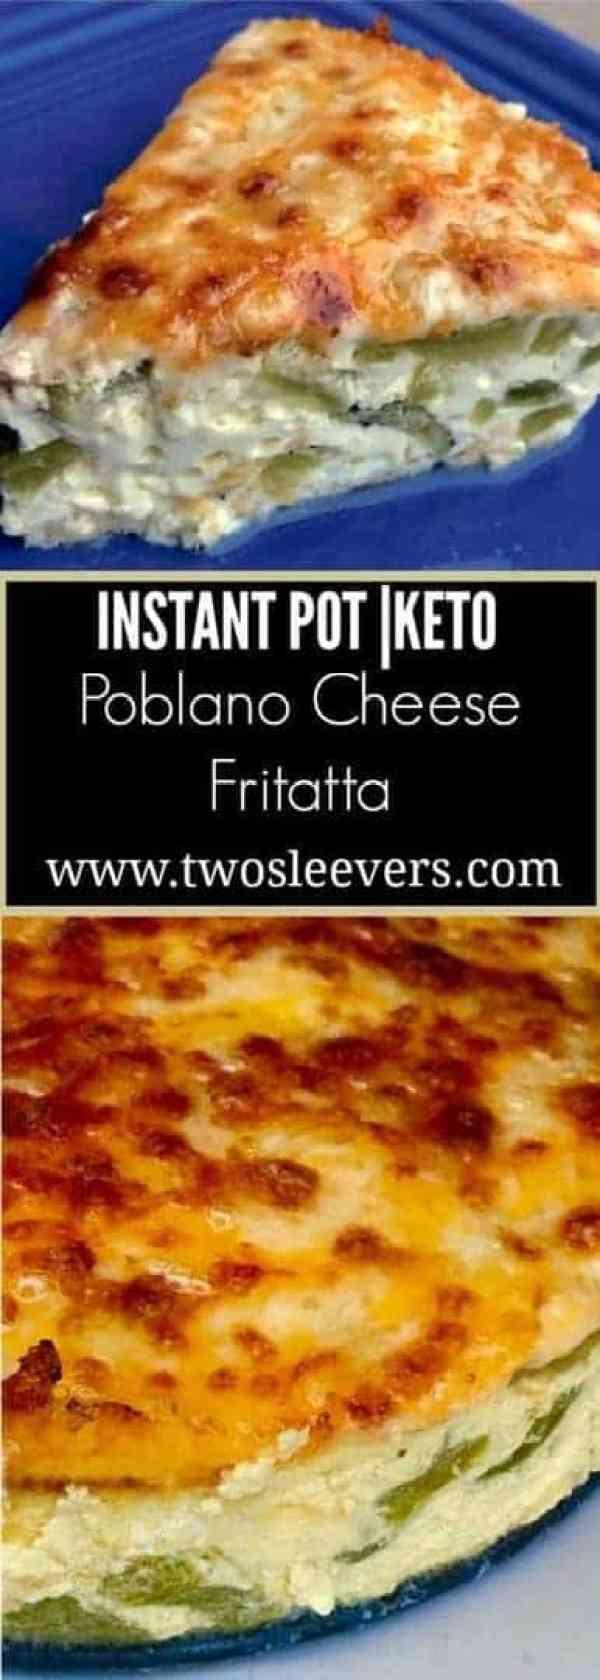 Poblano Cheese Pinterest - Pressure Cooker Keto Poblano Cheese Quiche - https://twosleevers.com